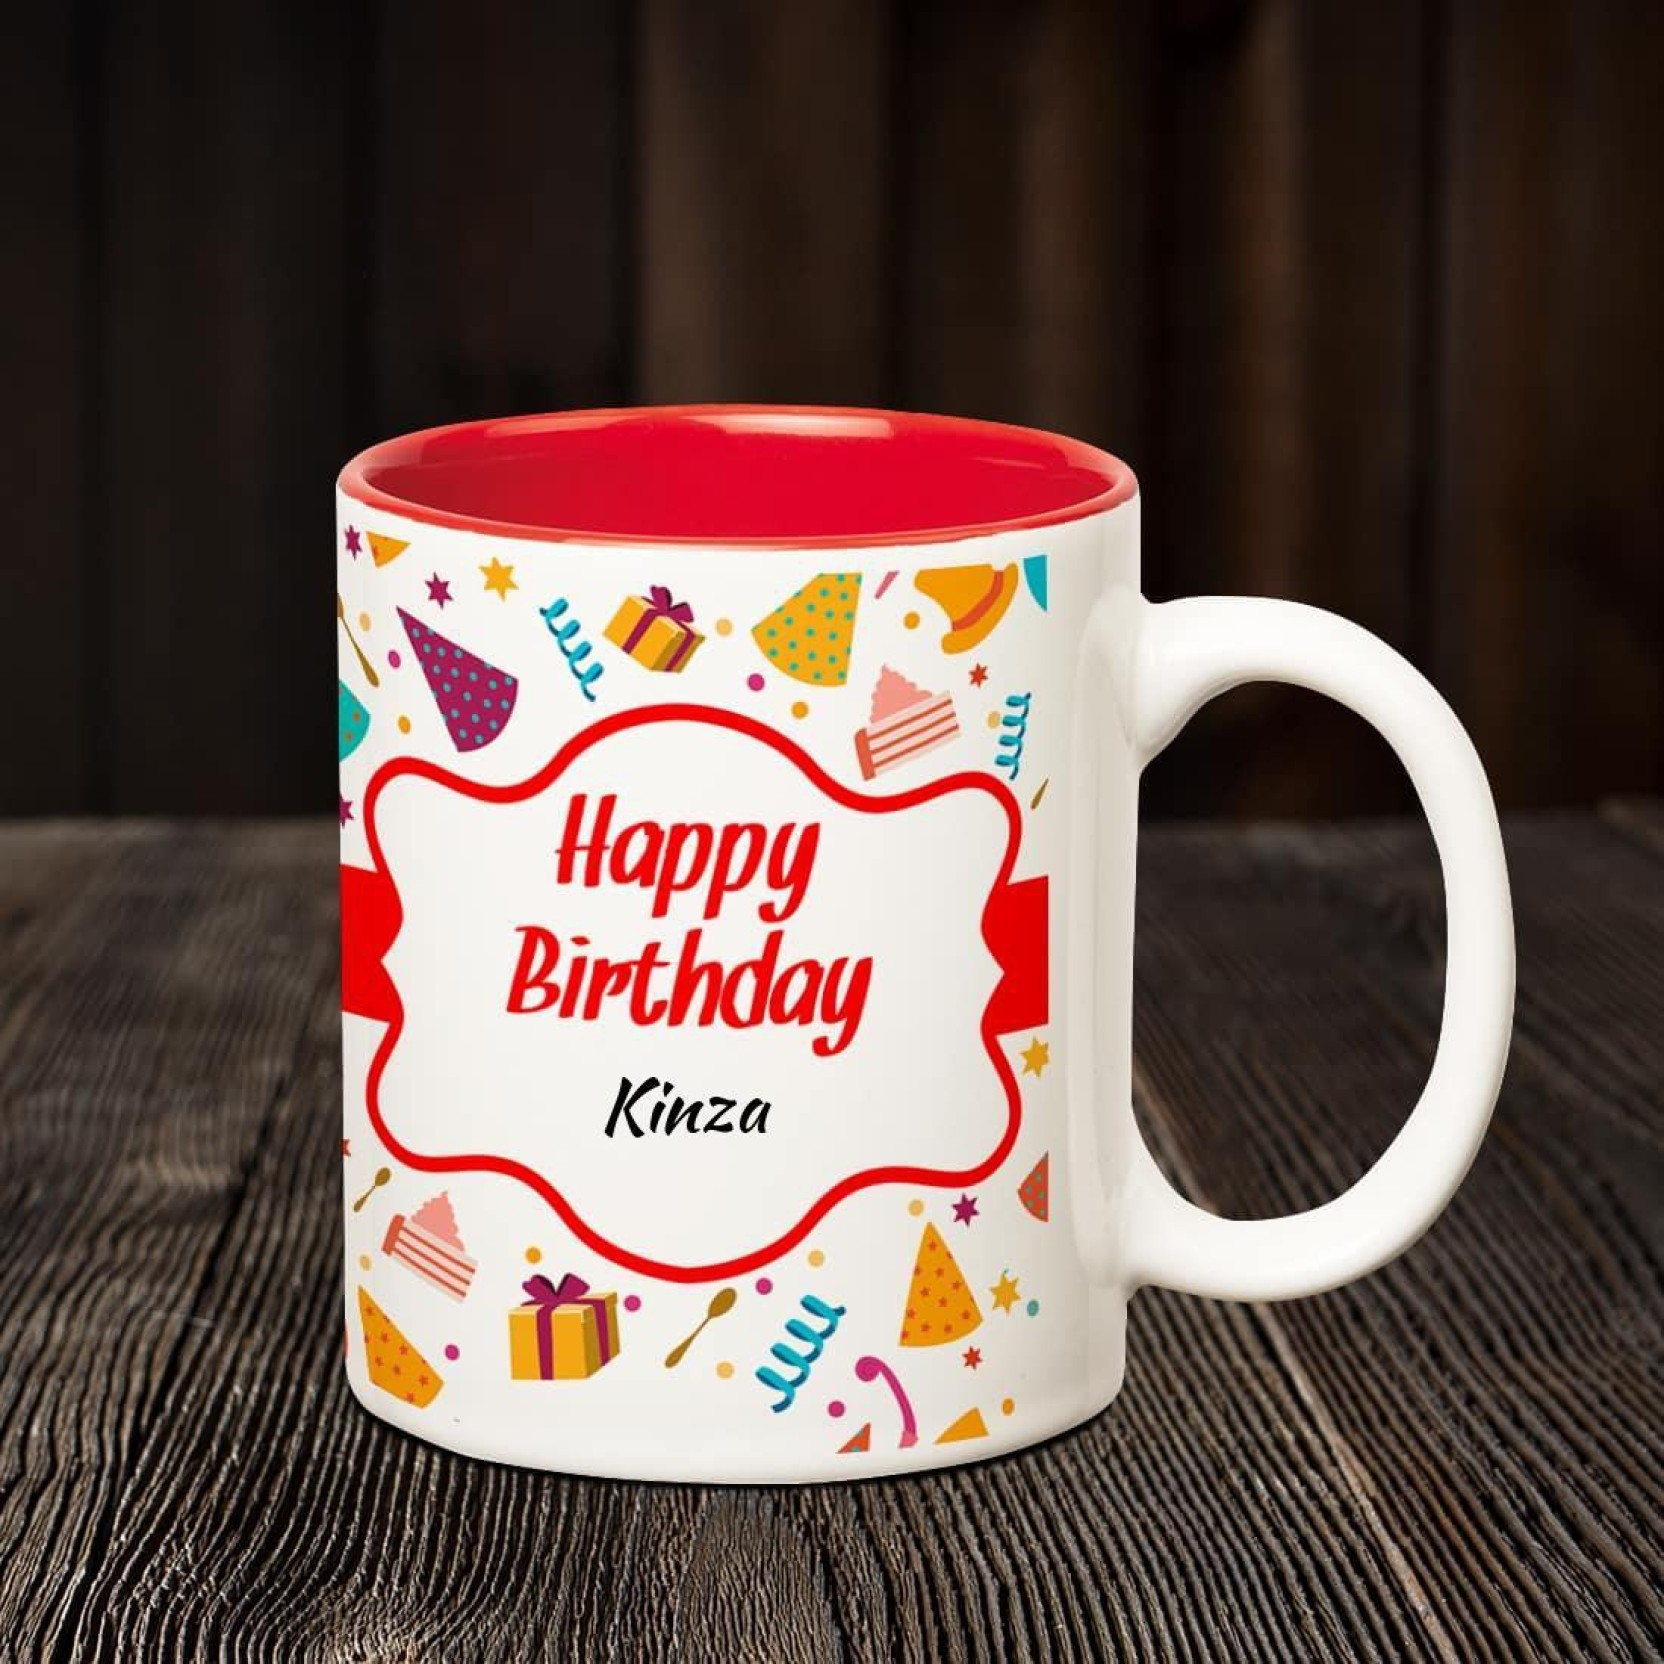 Huppme Happy Birthday Kinza Inner Red Coffee name mug Ceramic Mug